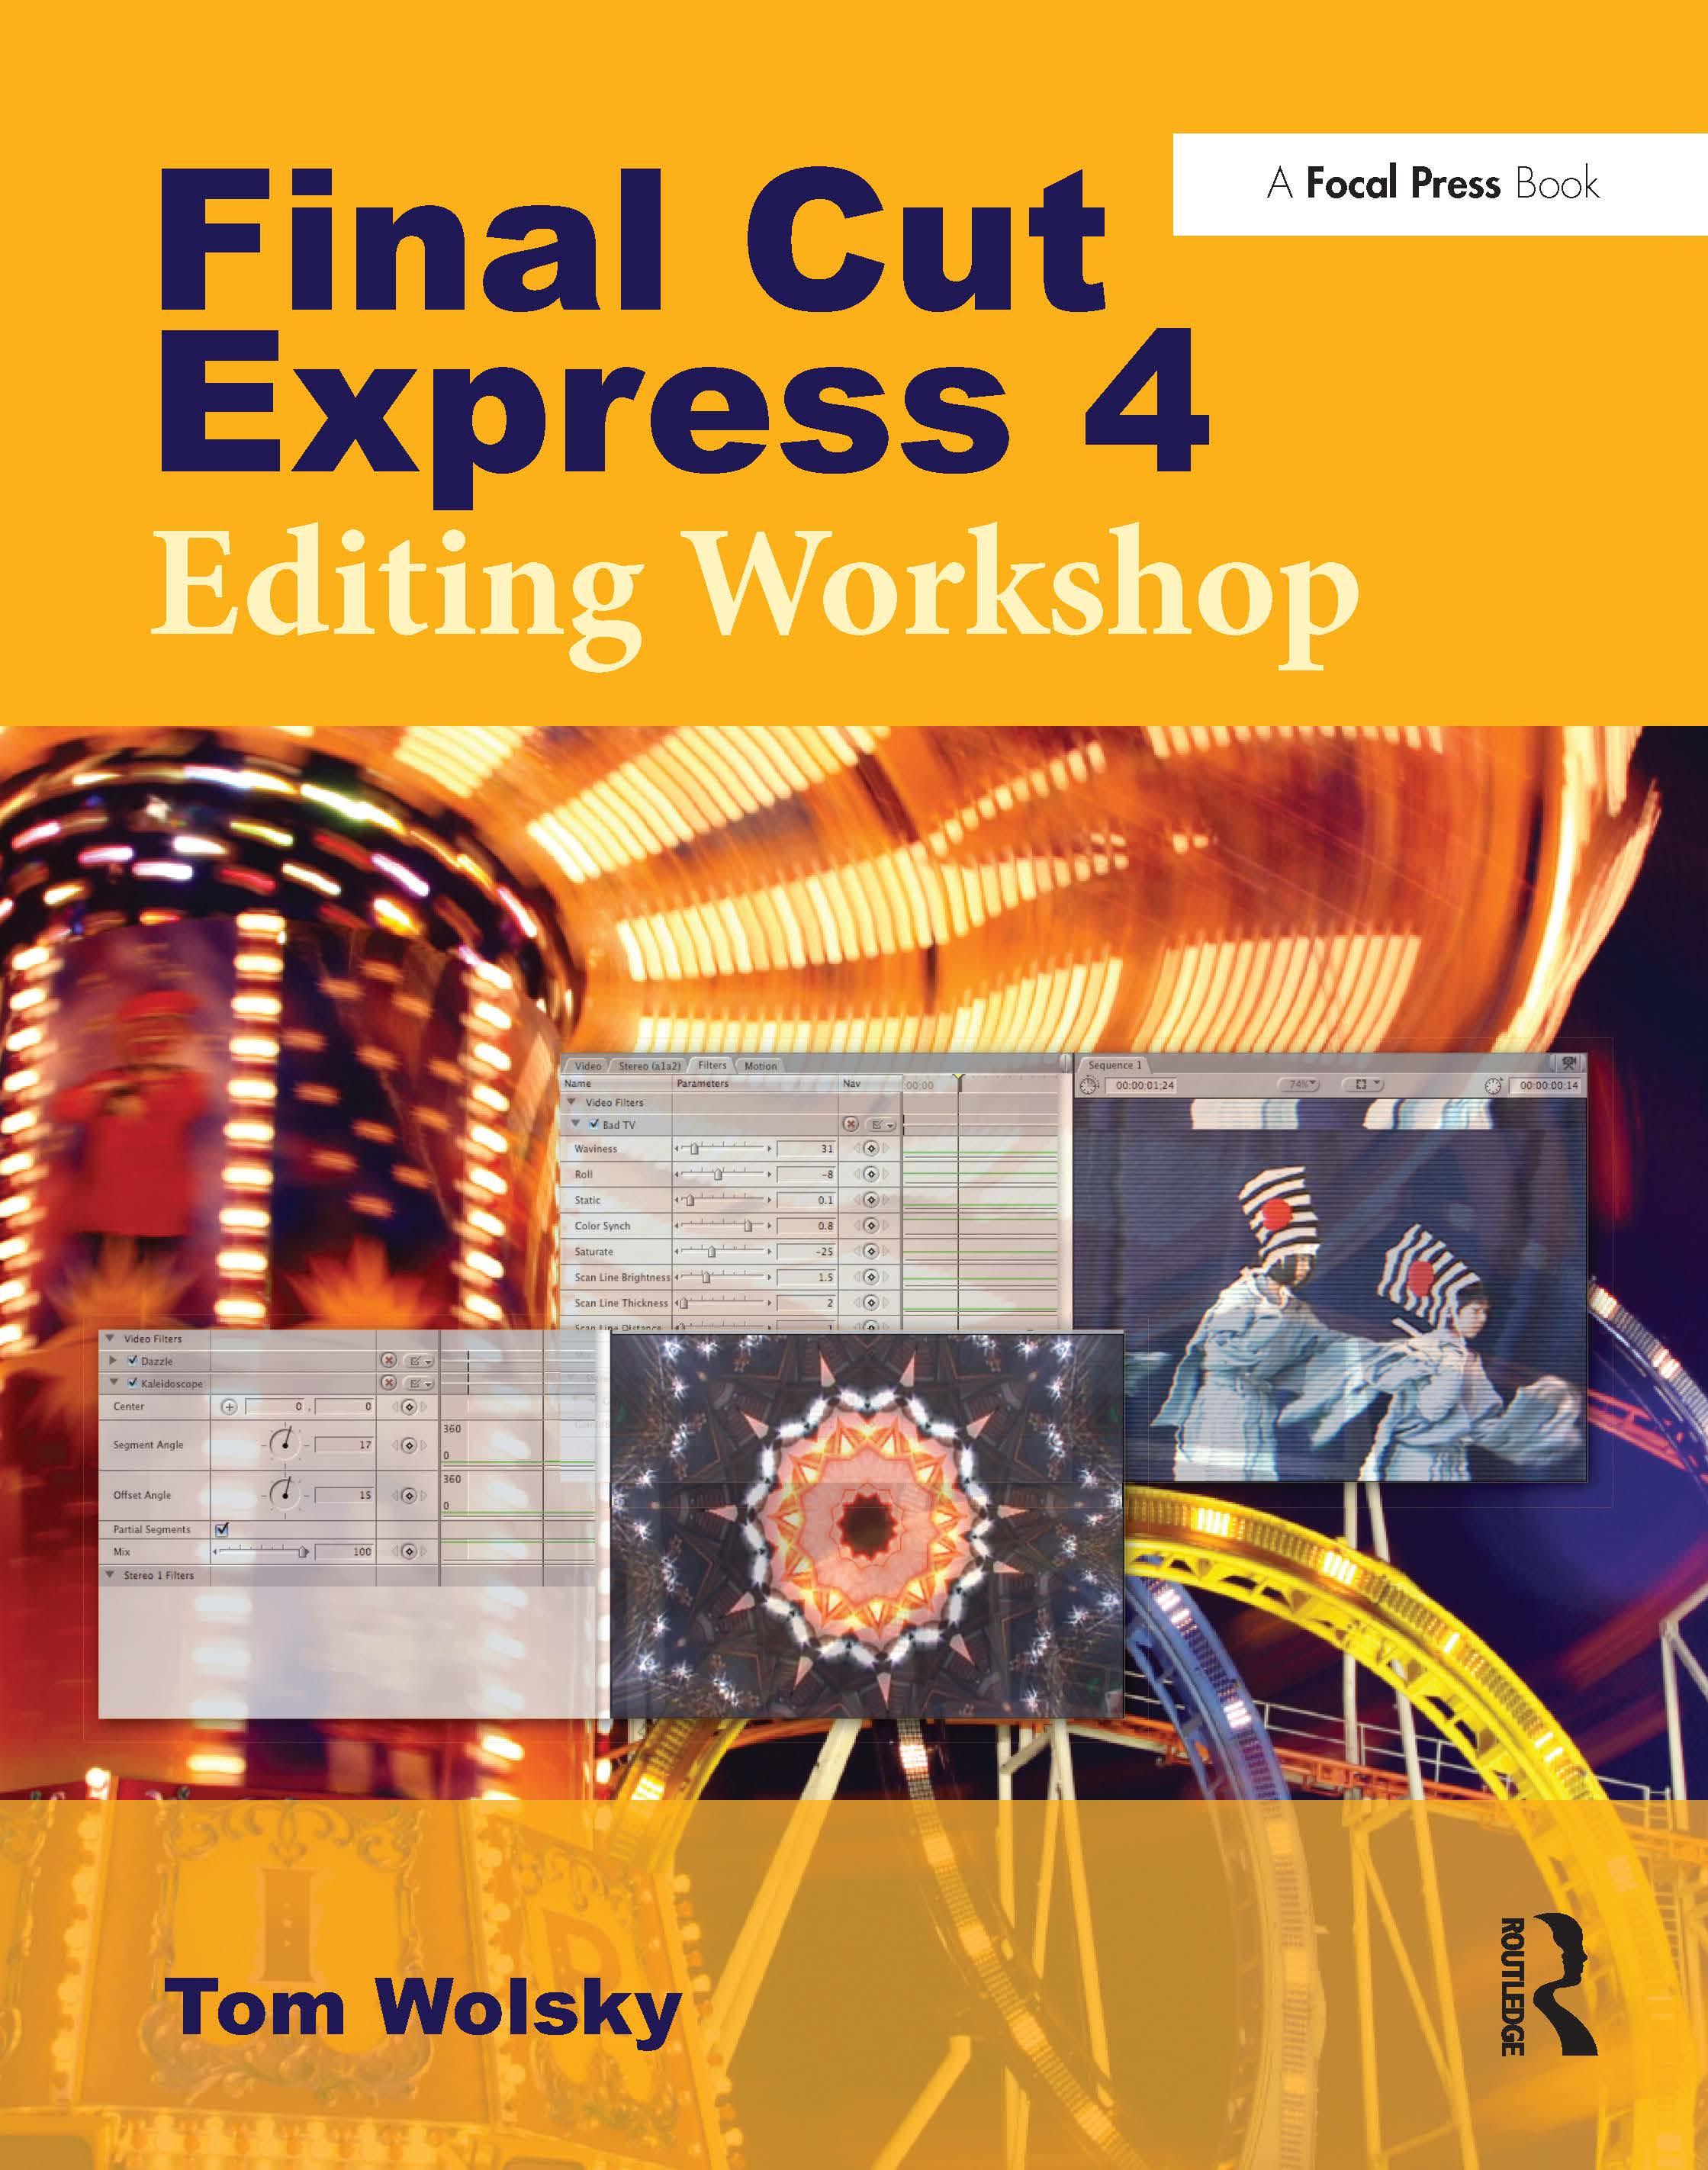 Final Cut Express 4 Editing Workshop book cover